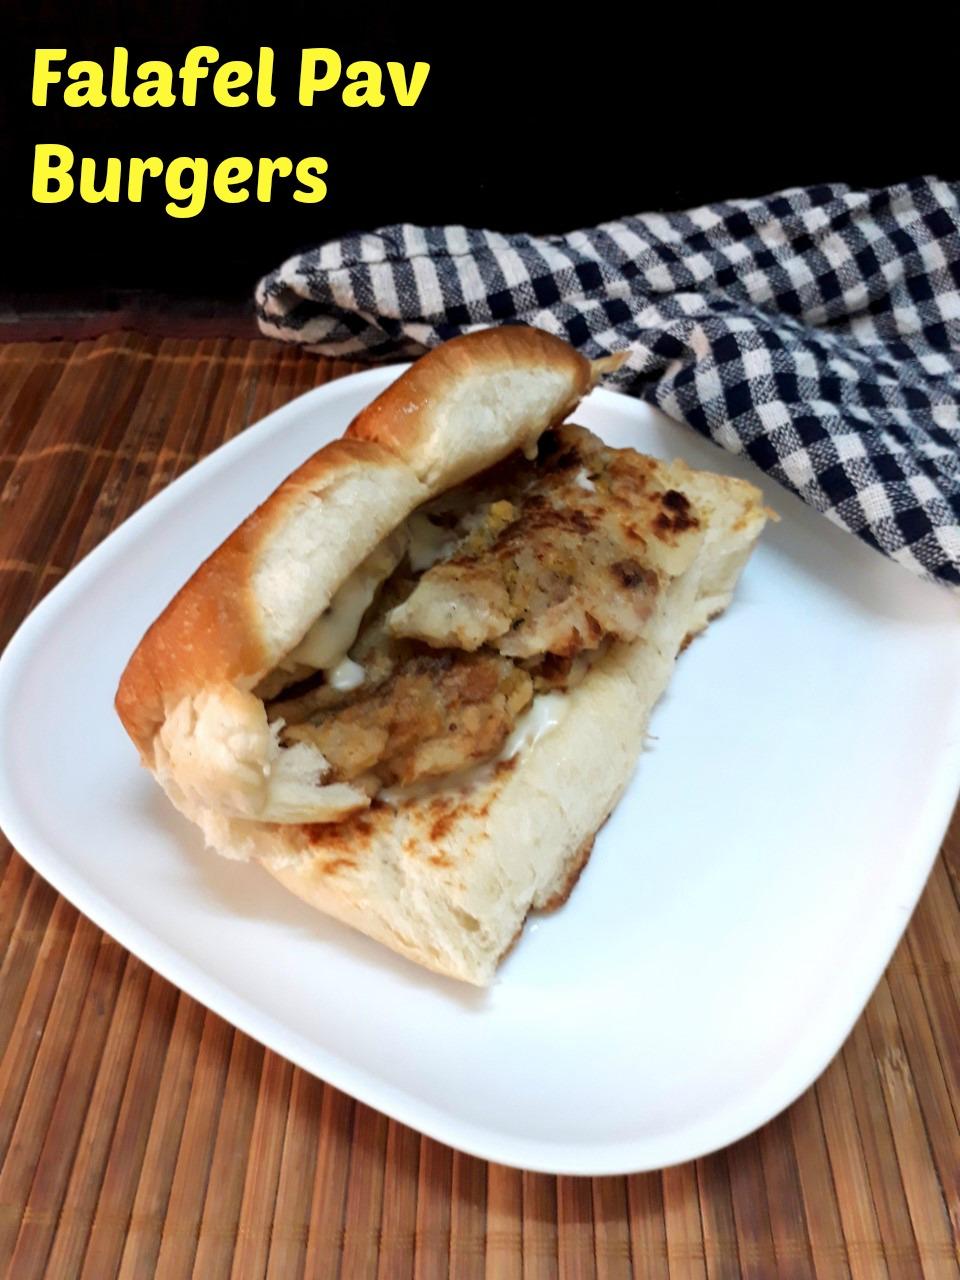 Falafel Pav Burgers